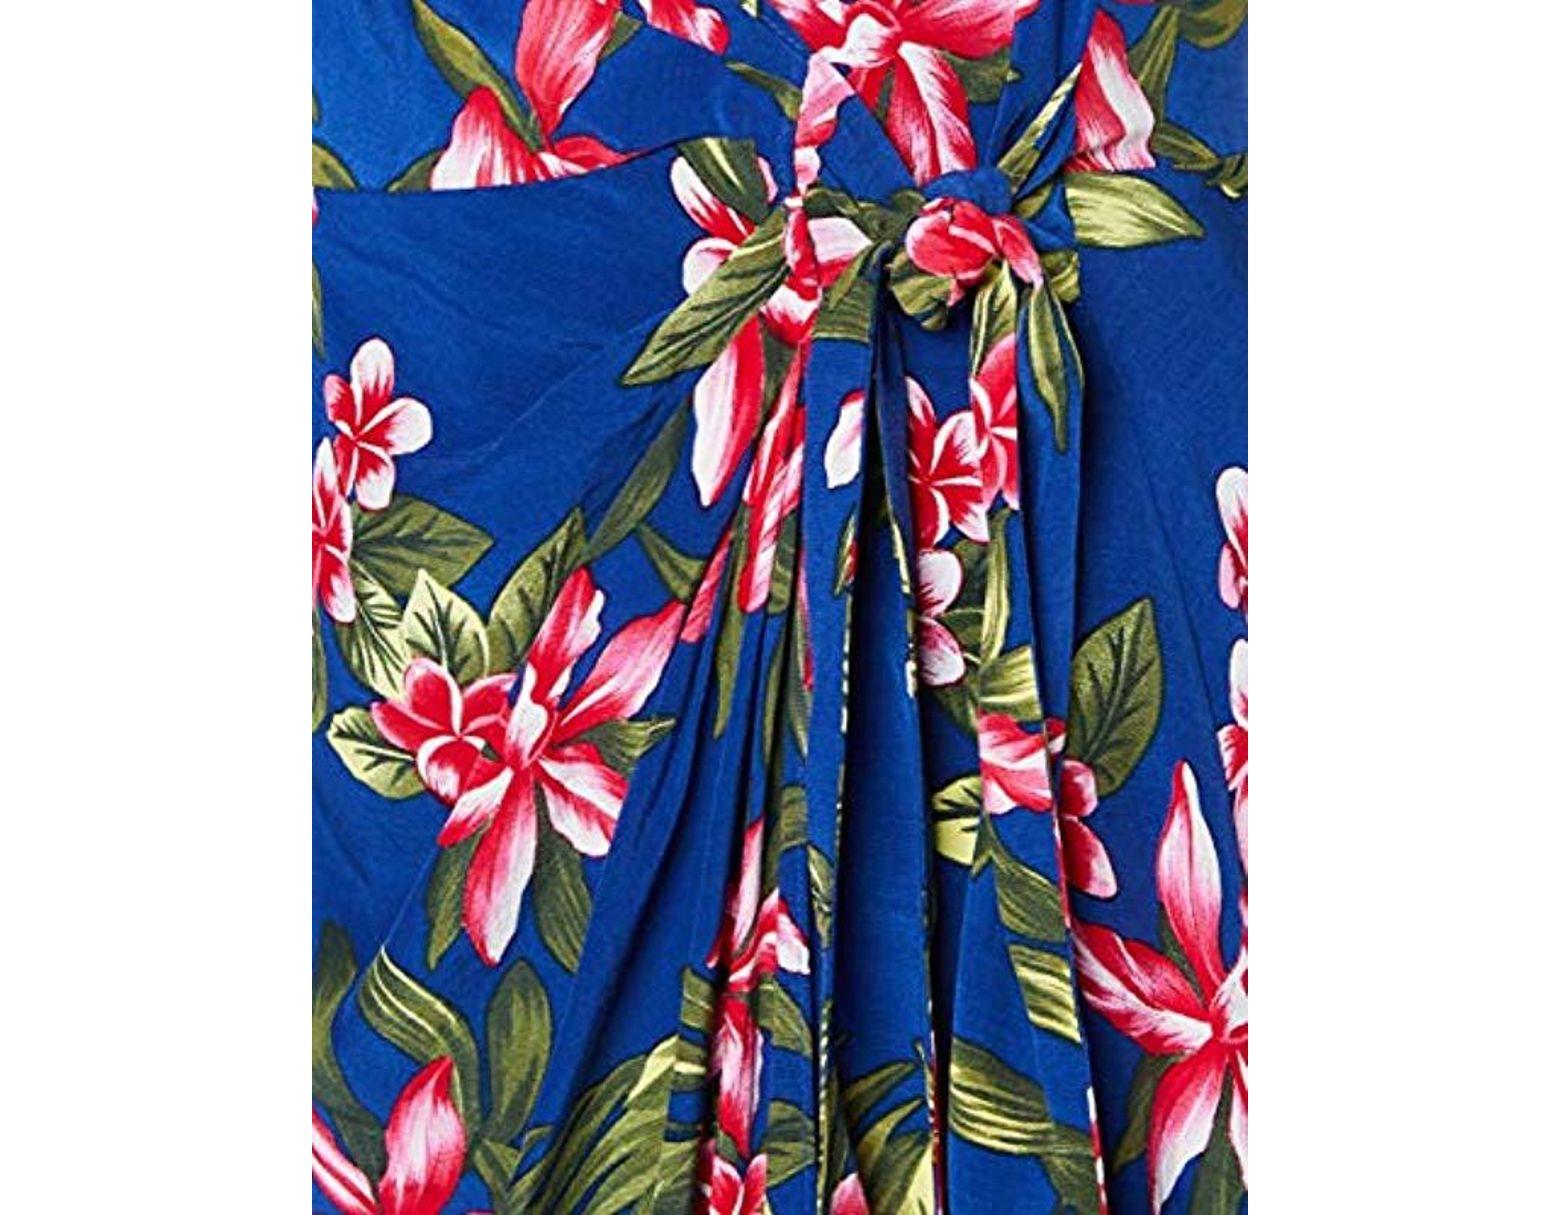 32d3cbe99352 Tommy Hilfiger Hallie Wrap Slip Dress Ns in Blue - Lyst